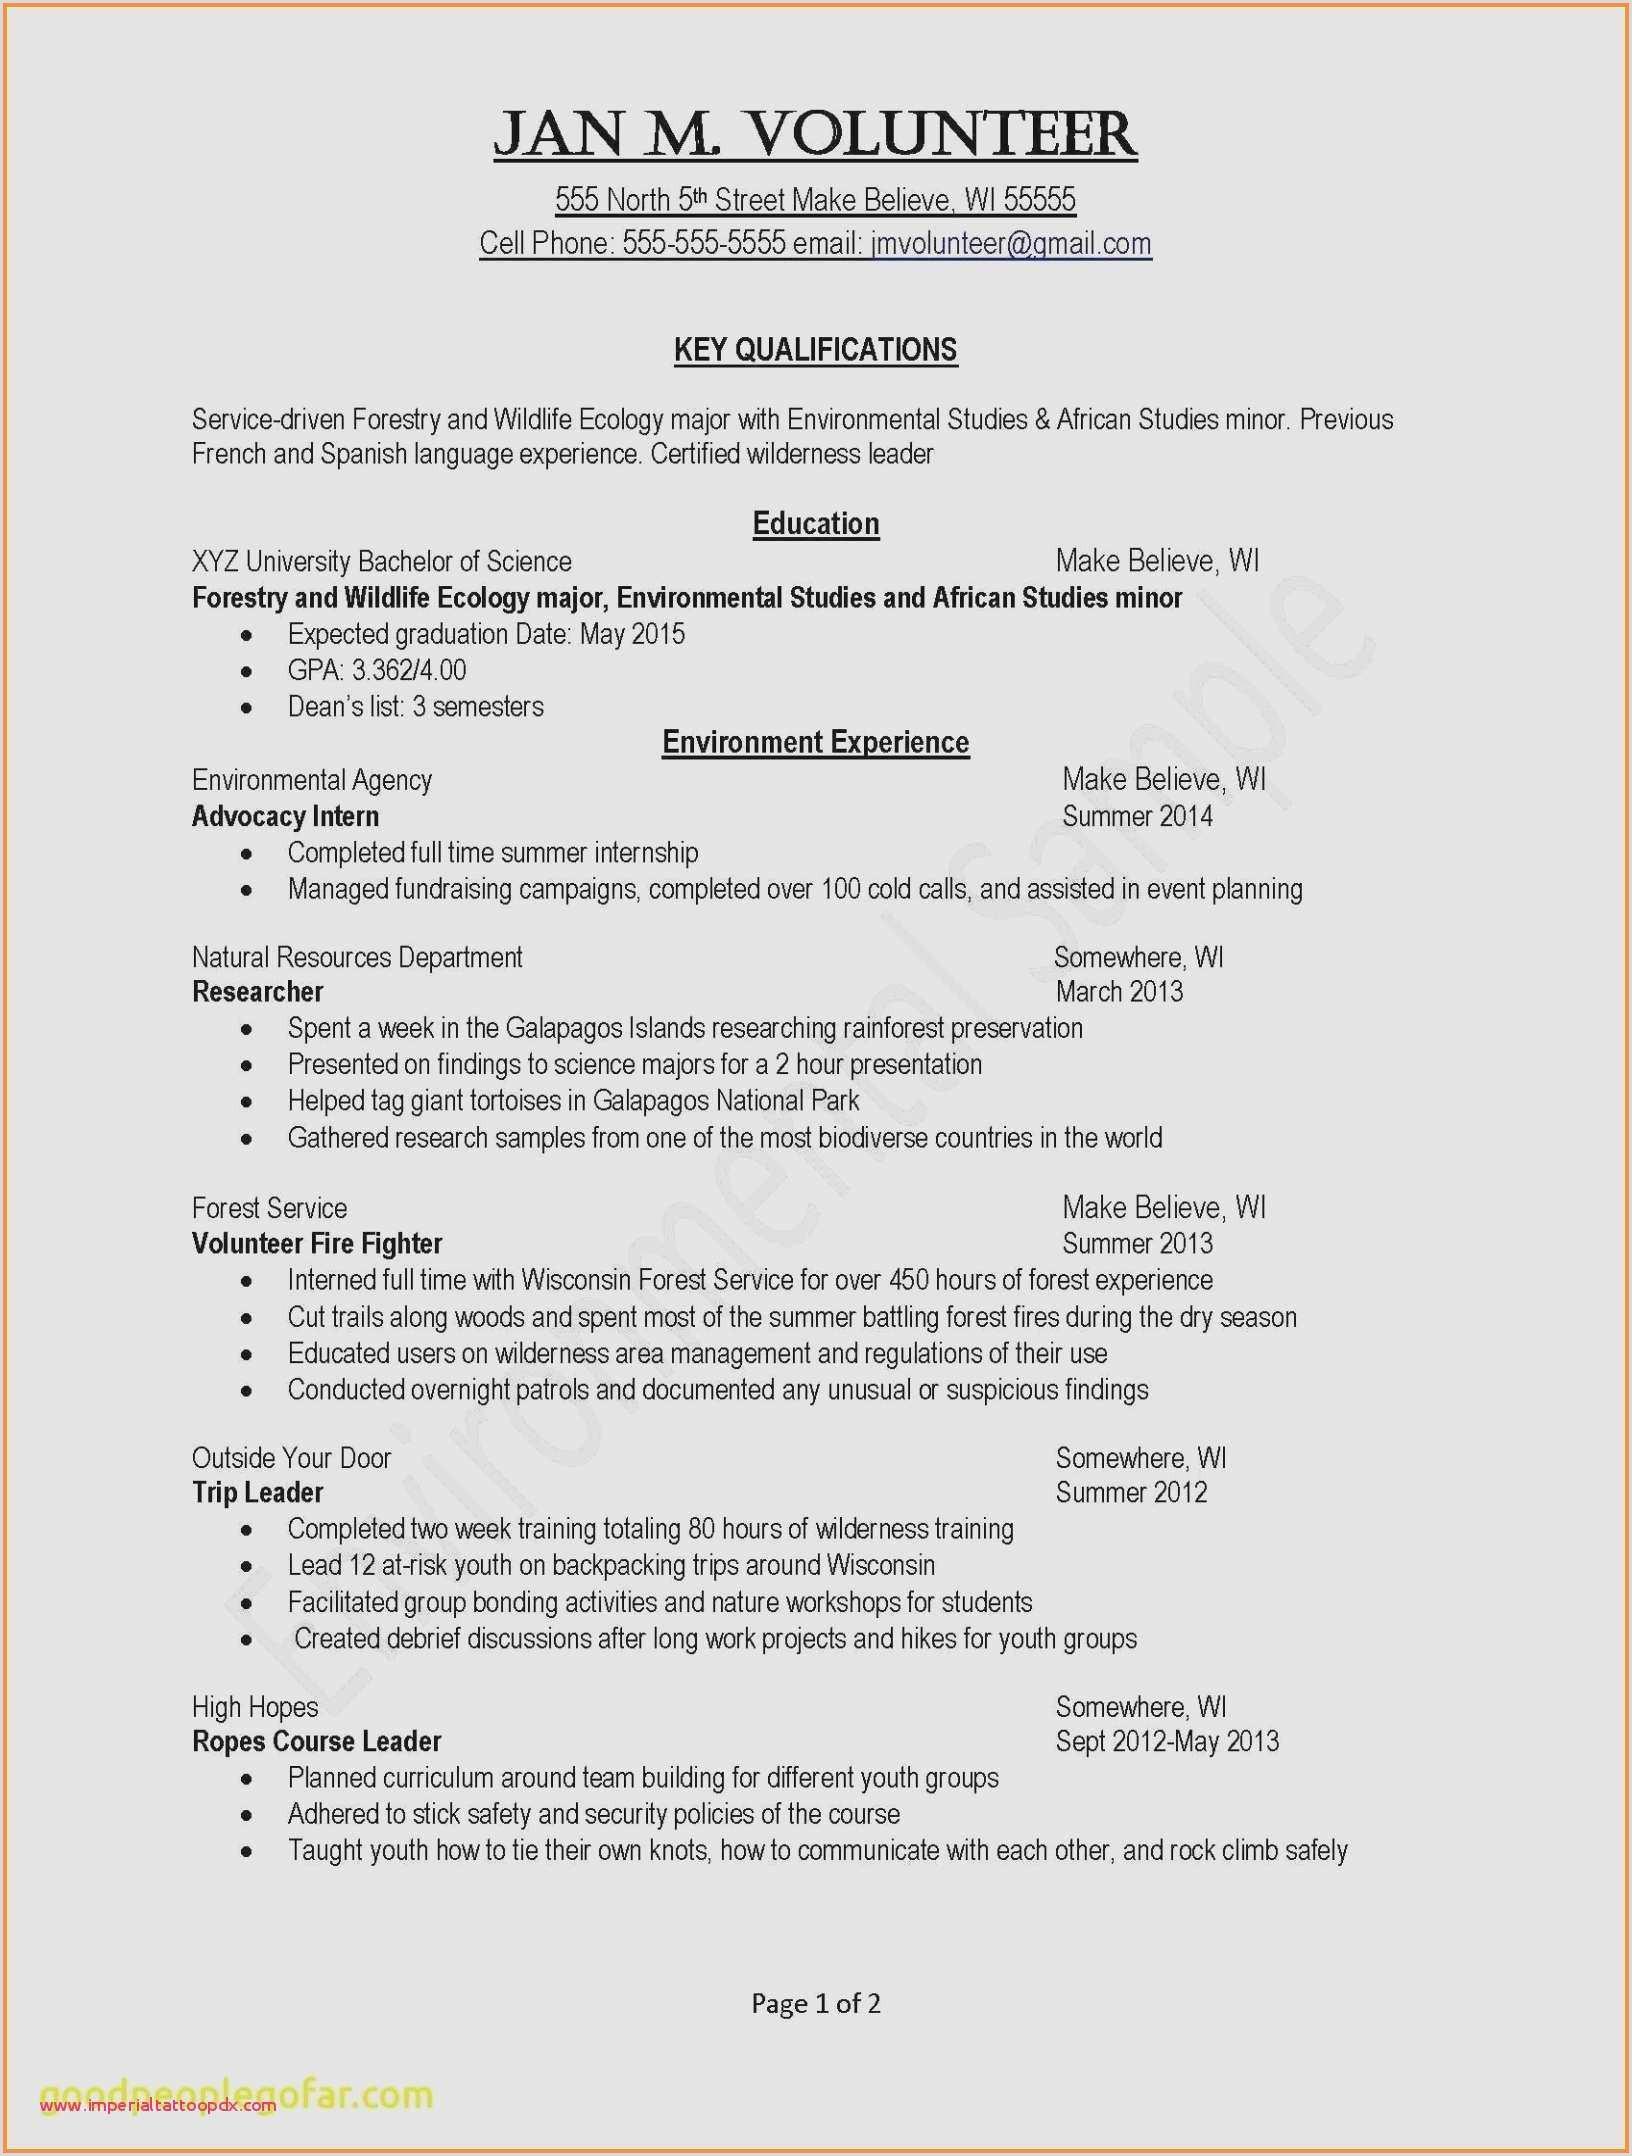 Lebenslauf Muster Doc Download Cv En Word Libre Cv Template Word Document Inspirational